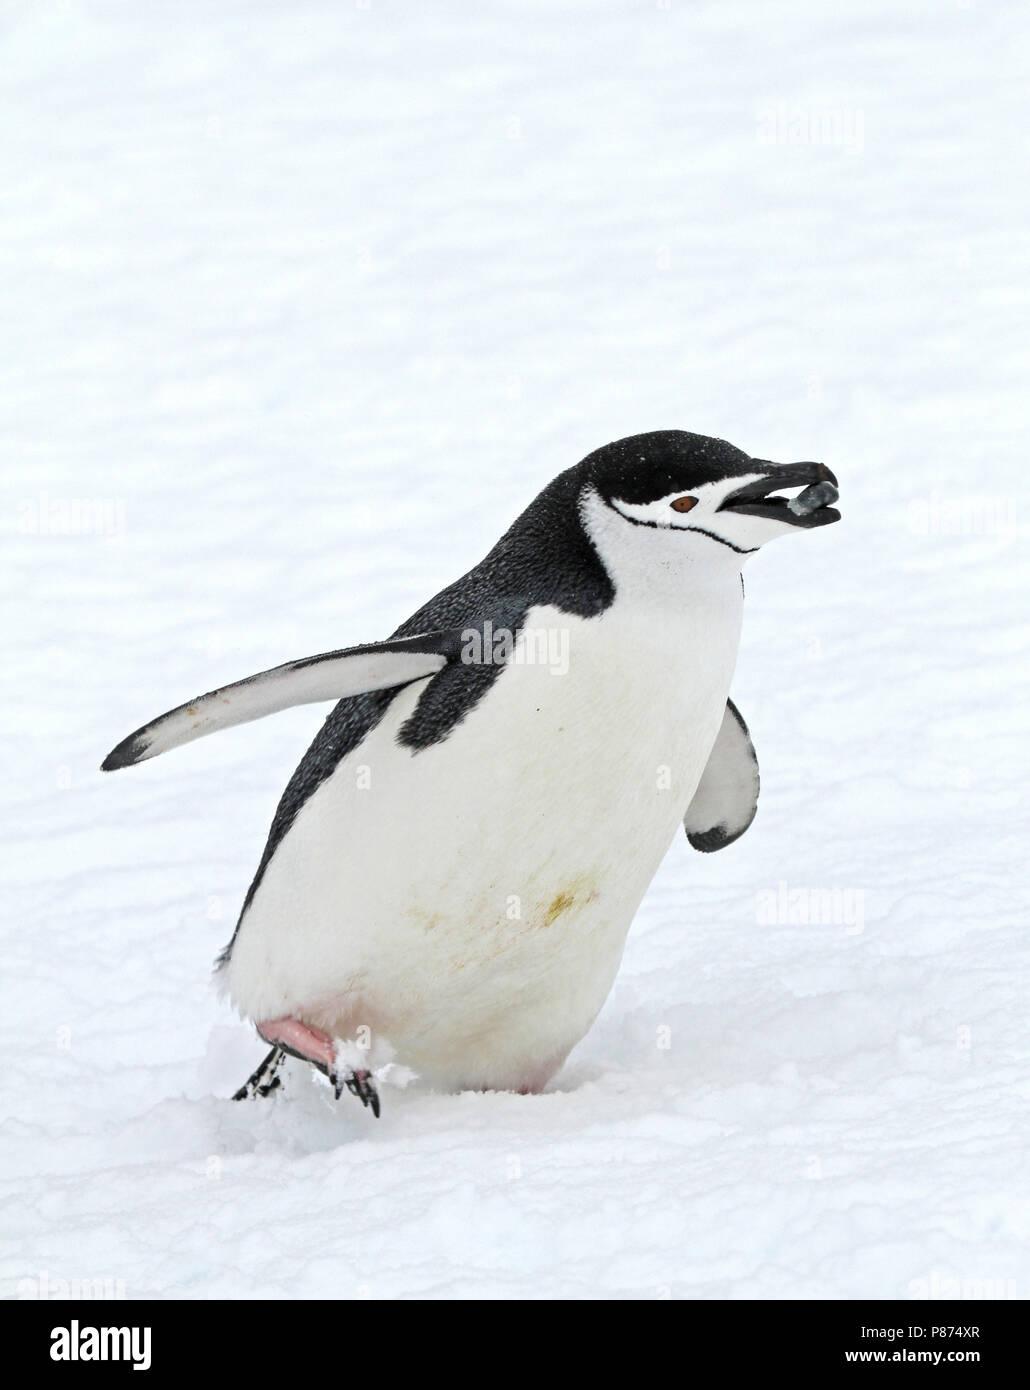 Chinstrap Penguin (Pygoscelis antarcticus) in Antarctica. Stock Photo